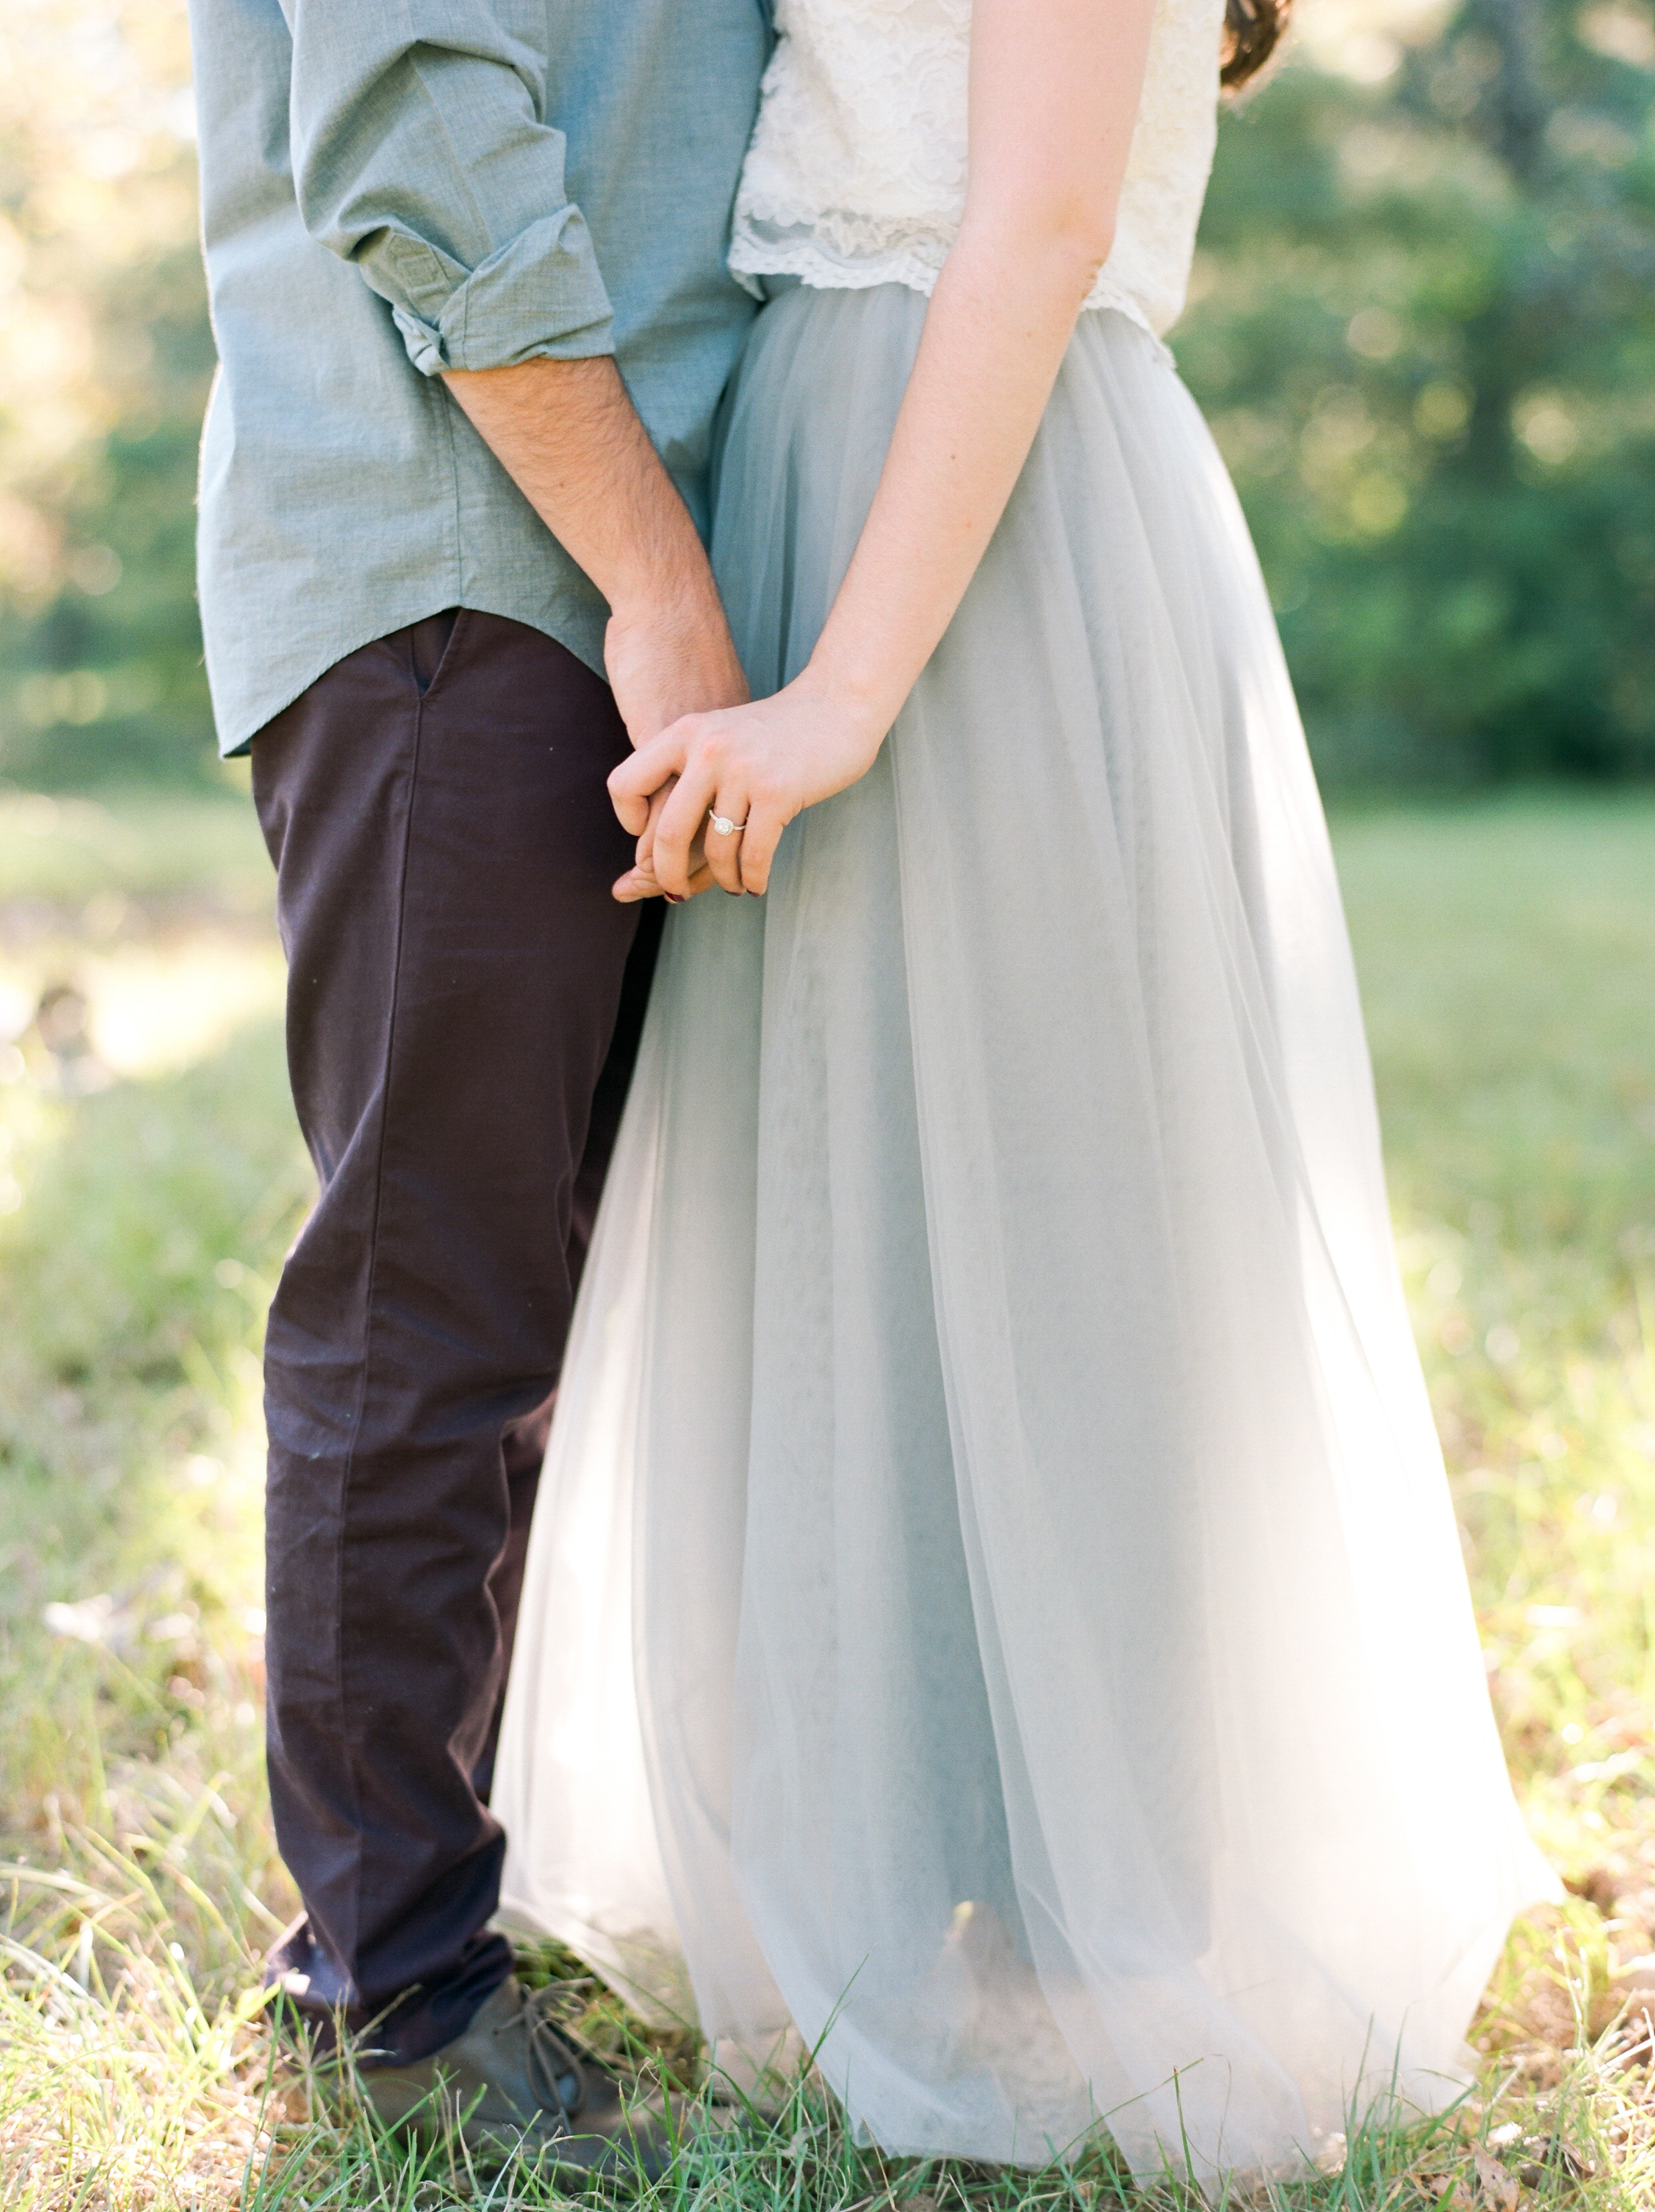 houston-wedding-photographer-college-station-austin-the-woodlands-film-photography-style-me-pretty-engagements-dana-fernandez-photography-12.jpg